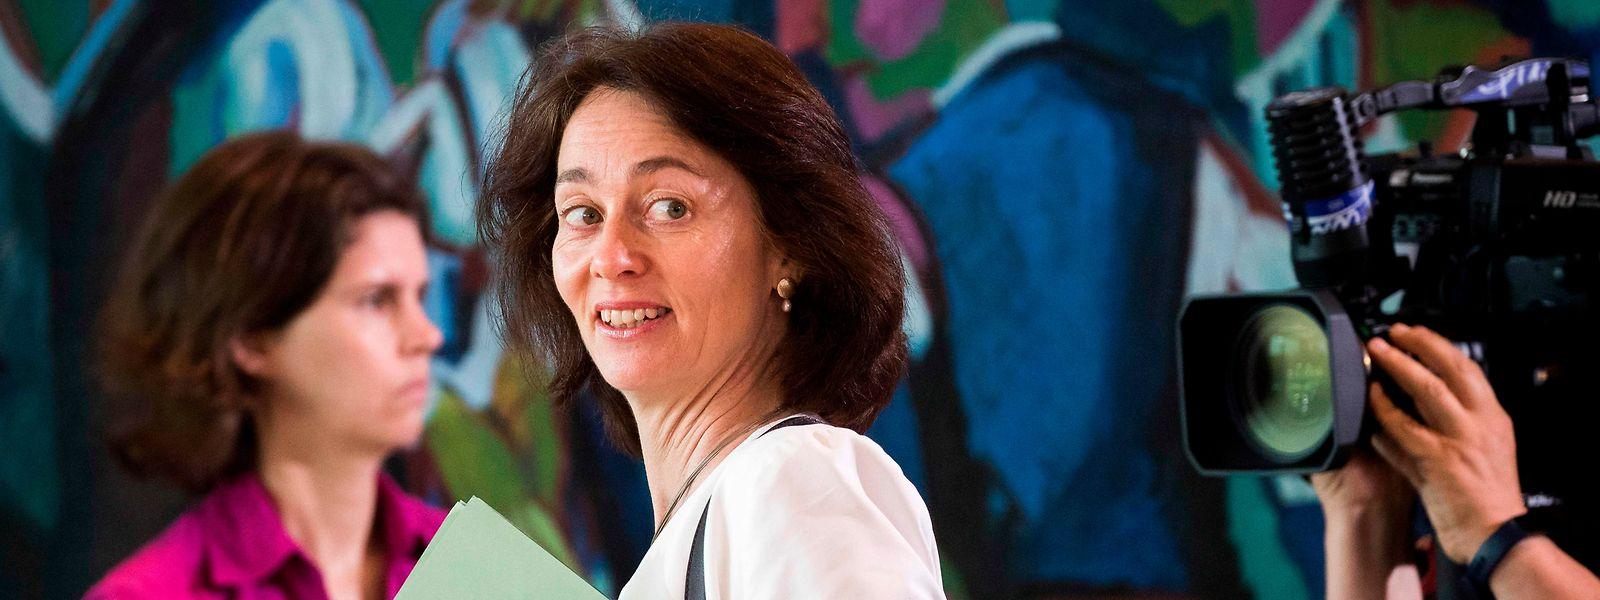 Die Vizepräsidentin des EU-Palaments Katarina Barley